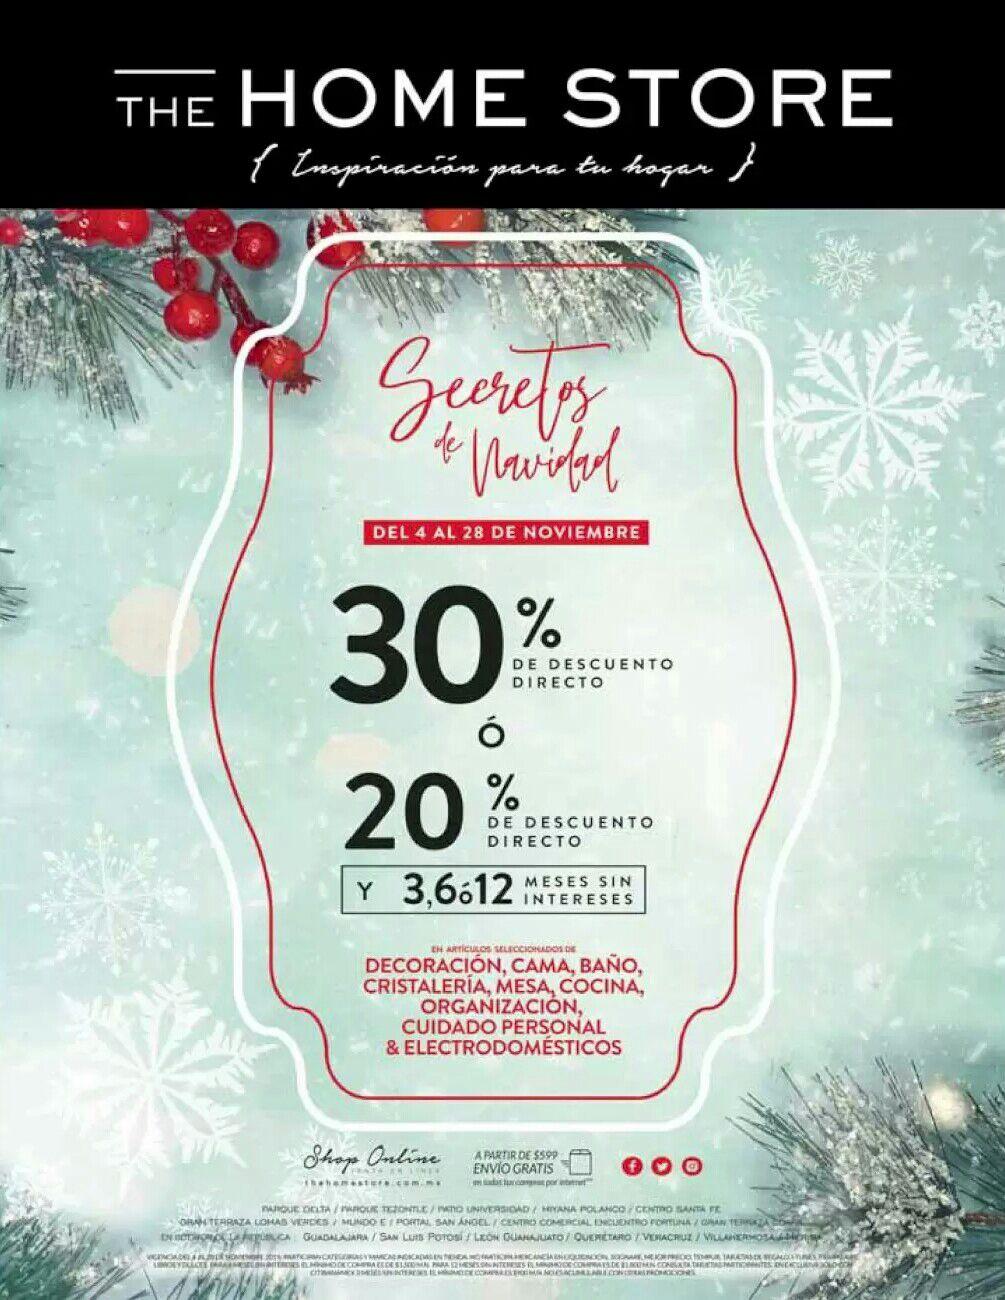 The Home Store: Secretos de Navidad: 30% de descuento directo... ó... 20% de descuento directo + 3, 6 o 12 MSI